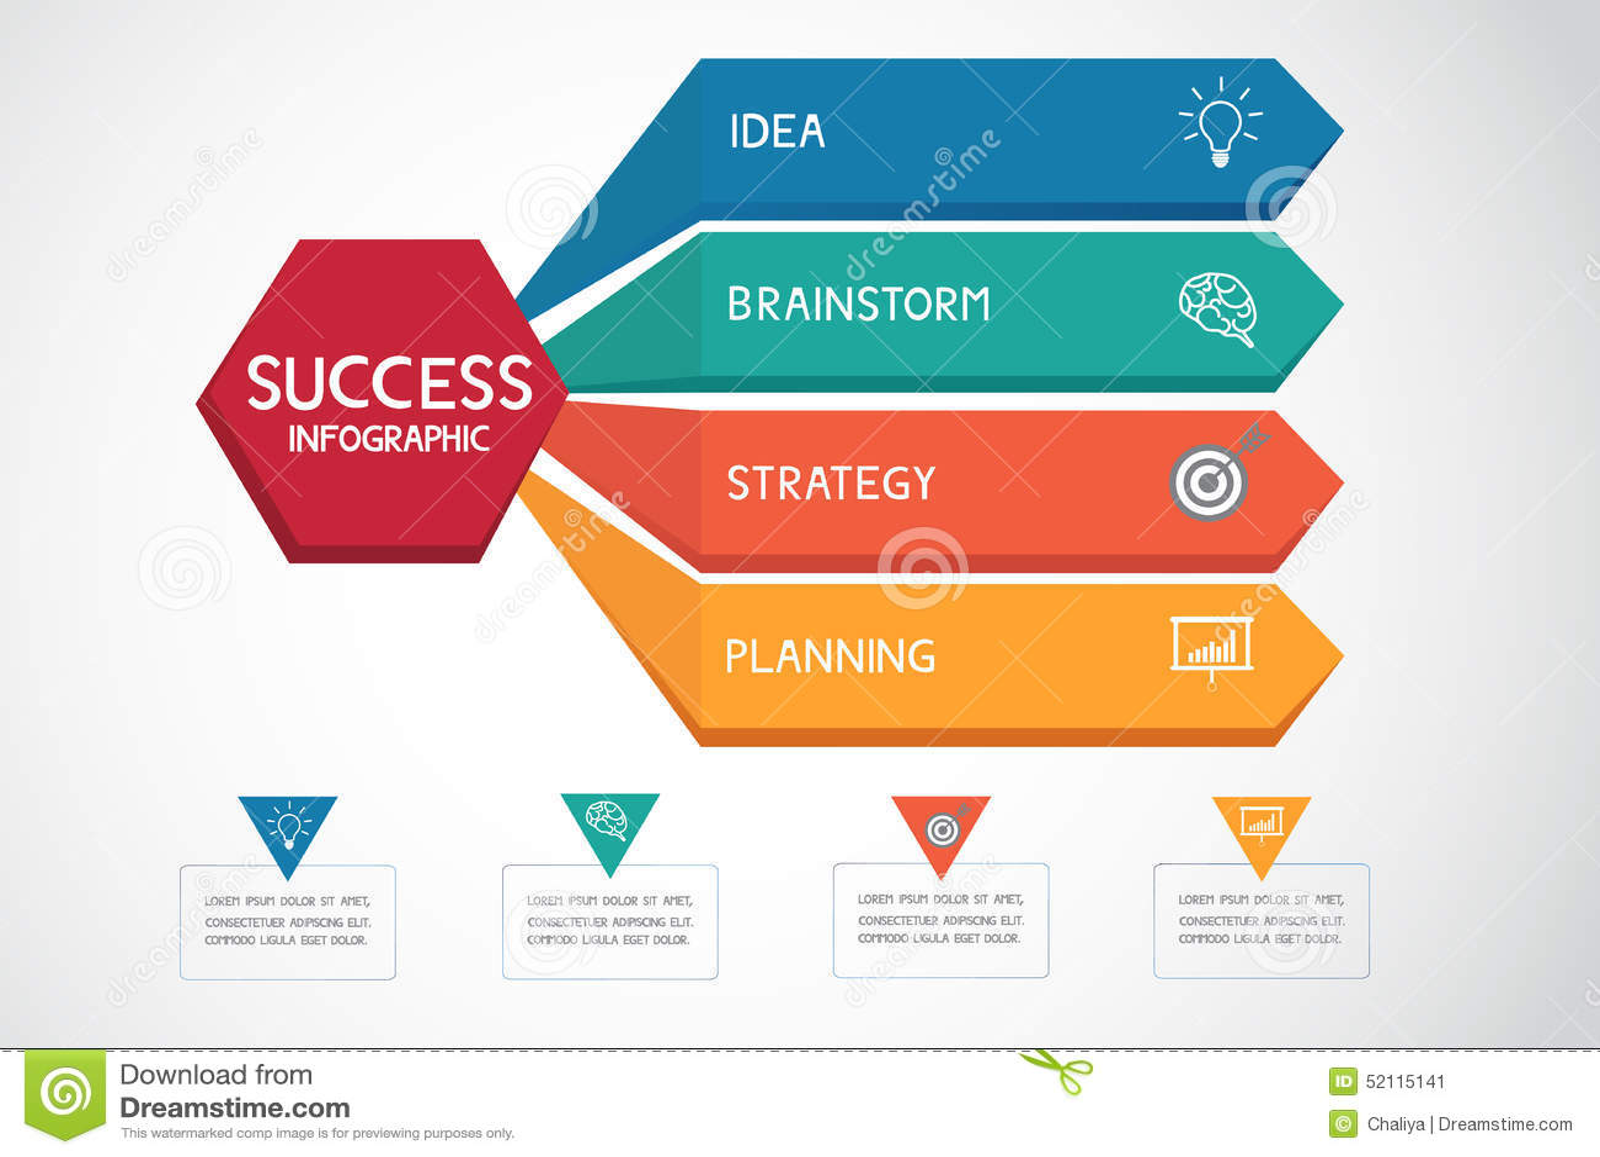 成功的企业概念infographic模板 能为工作流布局,图网络设计, infographics使用